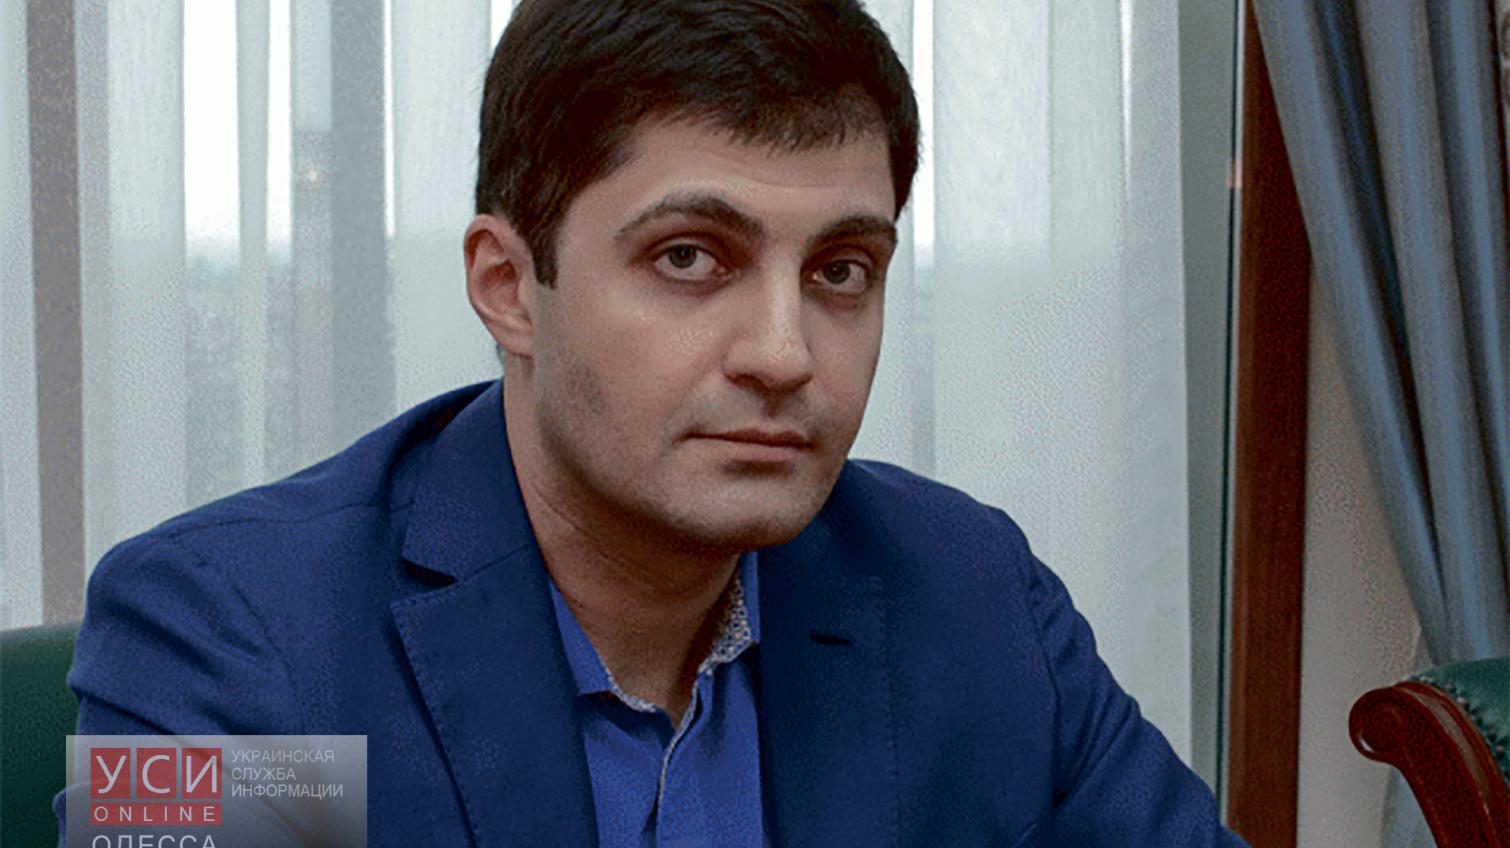 Сакварелидзе ожидал наступление «квази-политиков» на Саакашвили «фото»